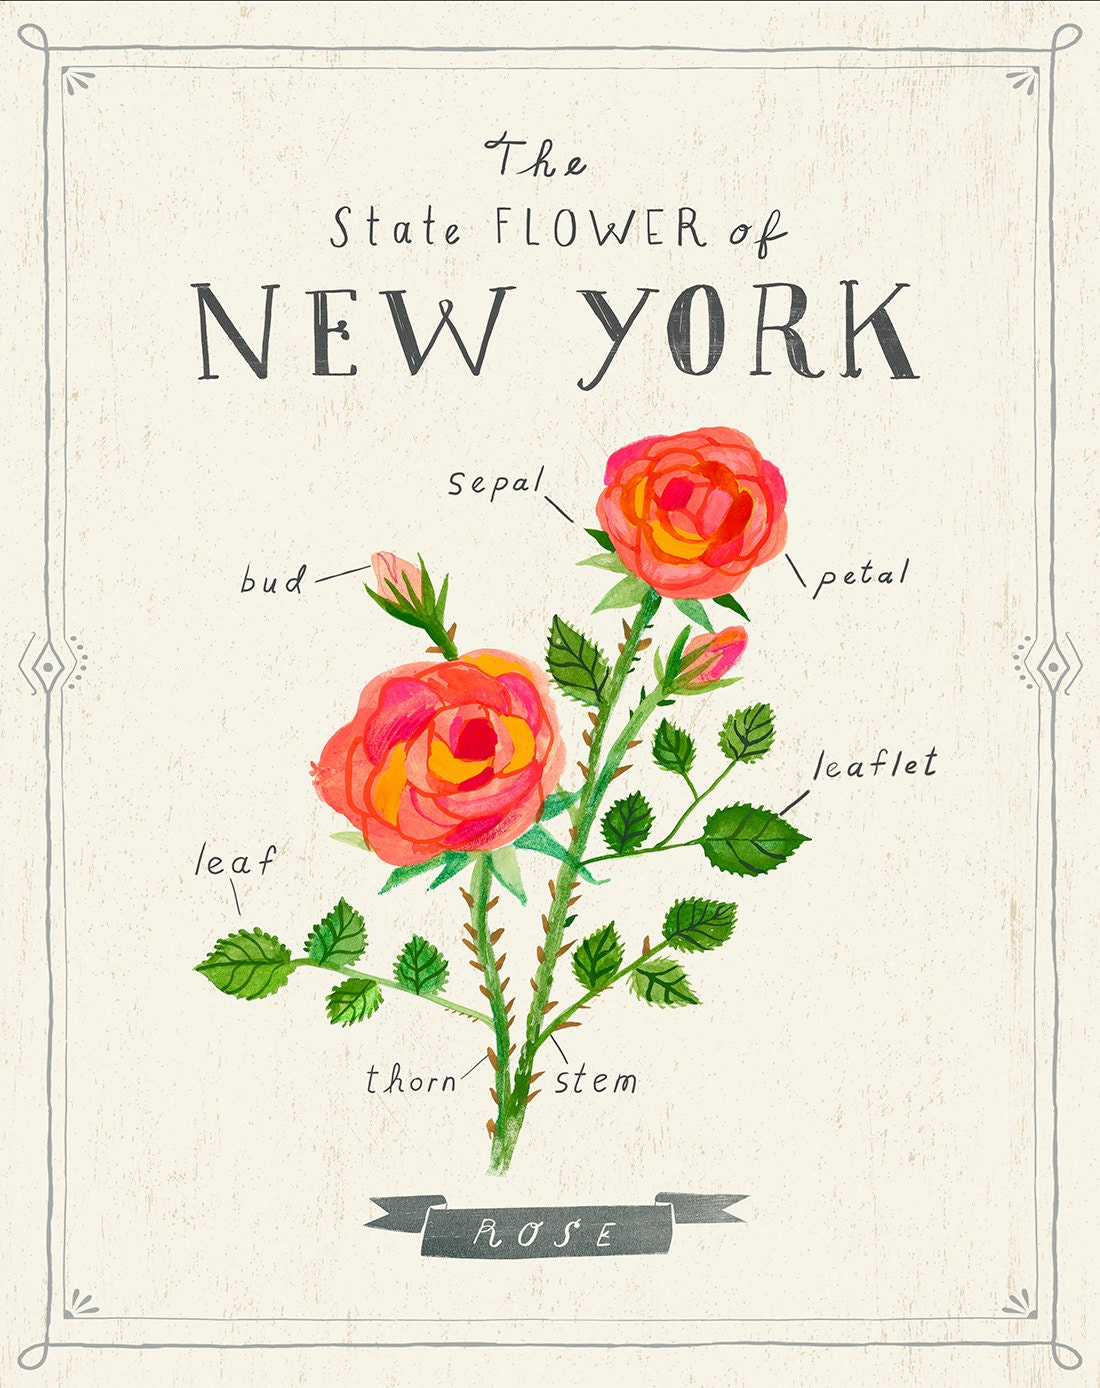 New York State Flower Print The Rose